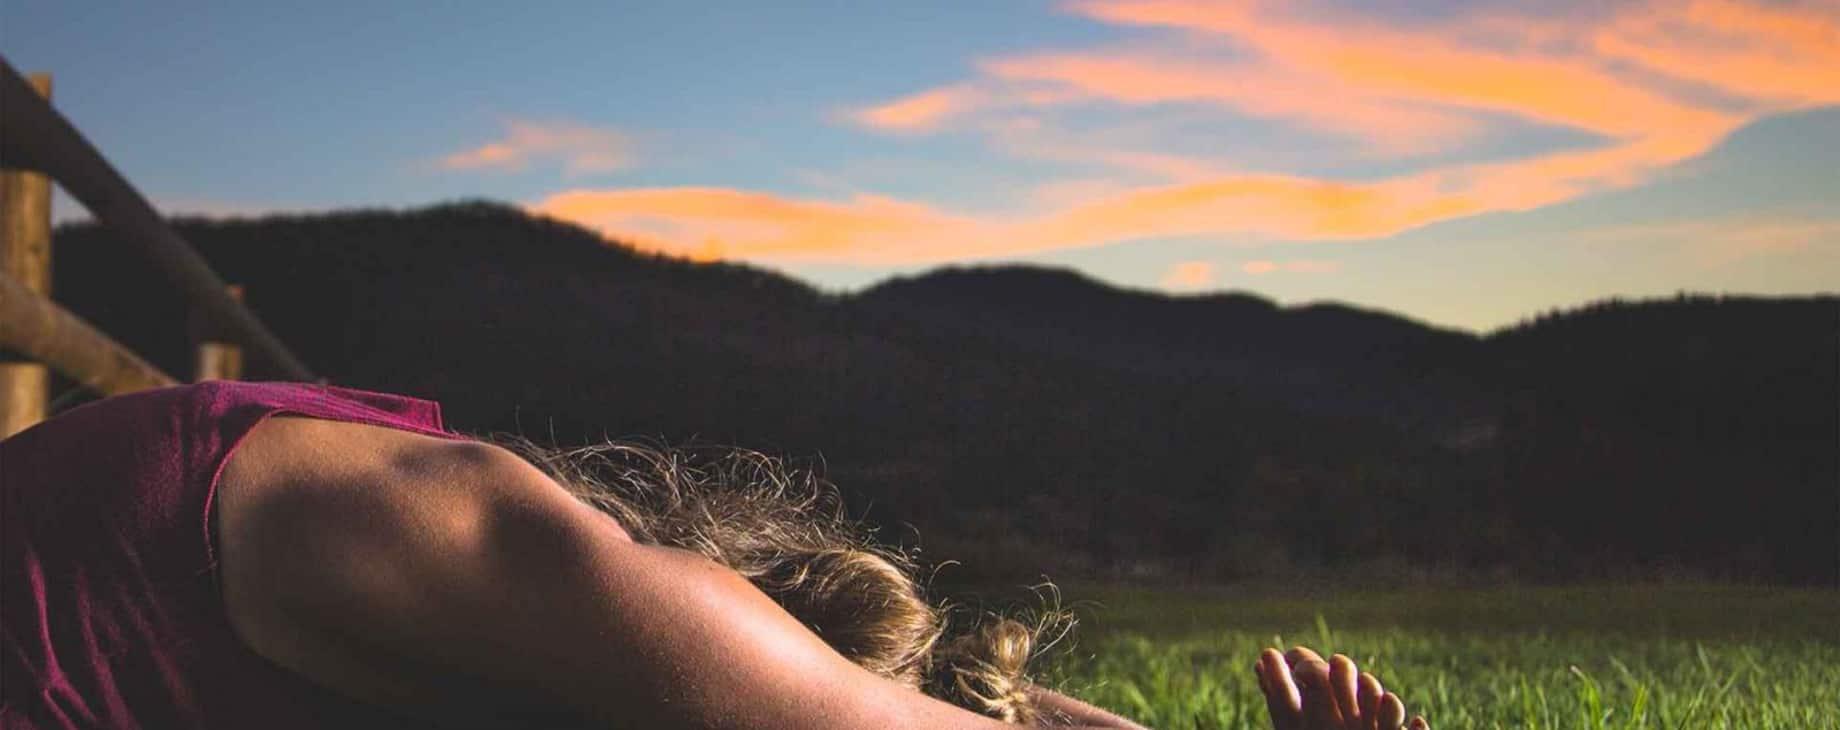 Fact Sheet Yoga Retreats Packages